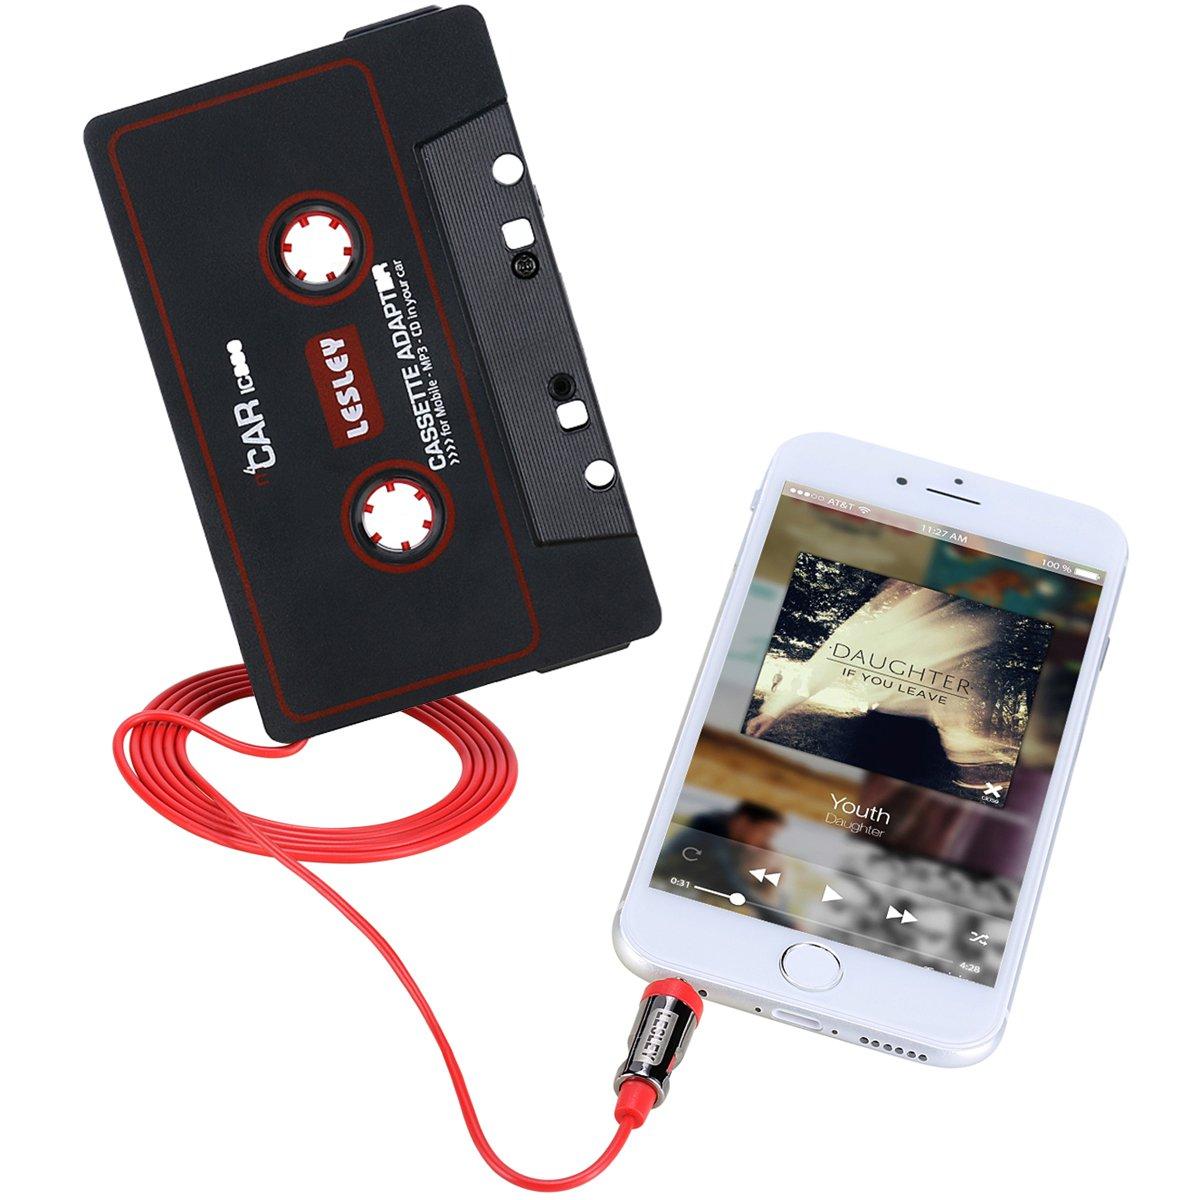 Car Cassette Adapter Reshow IG-LX-A19-60W-6PK